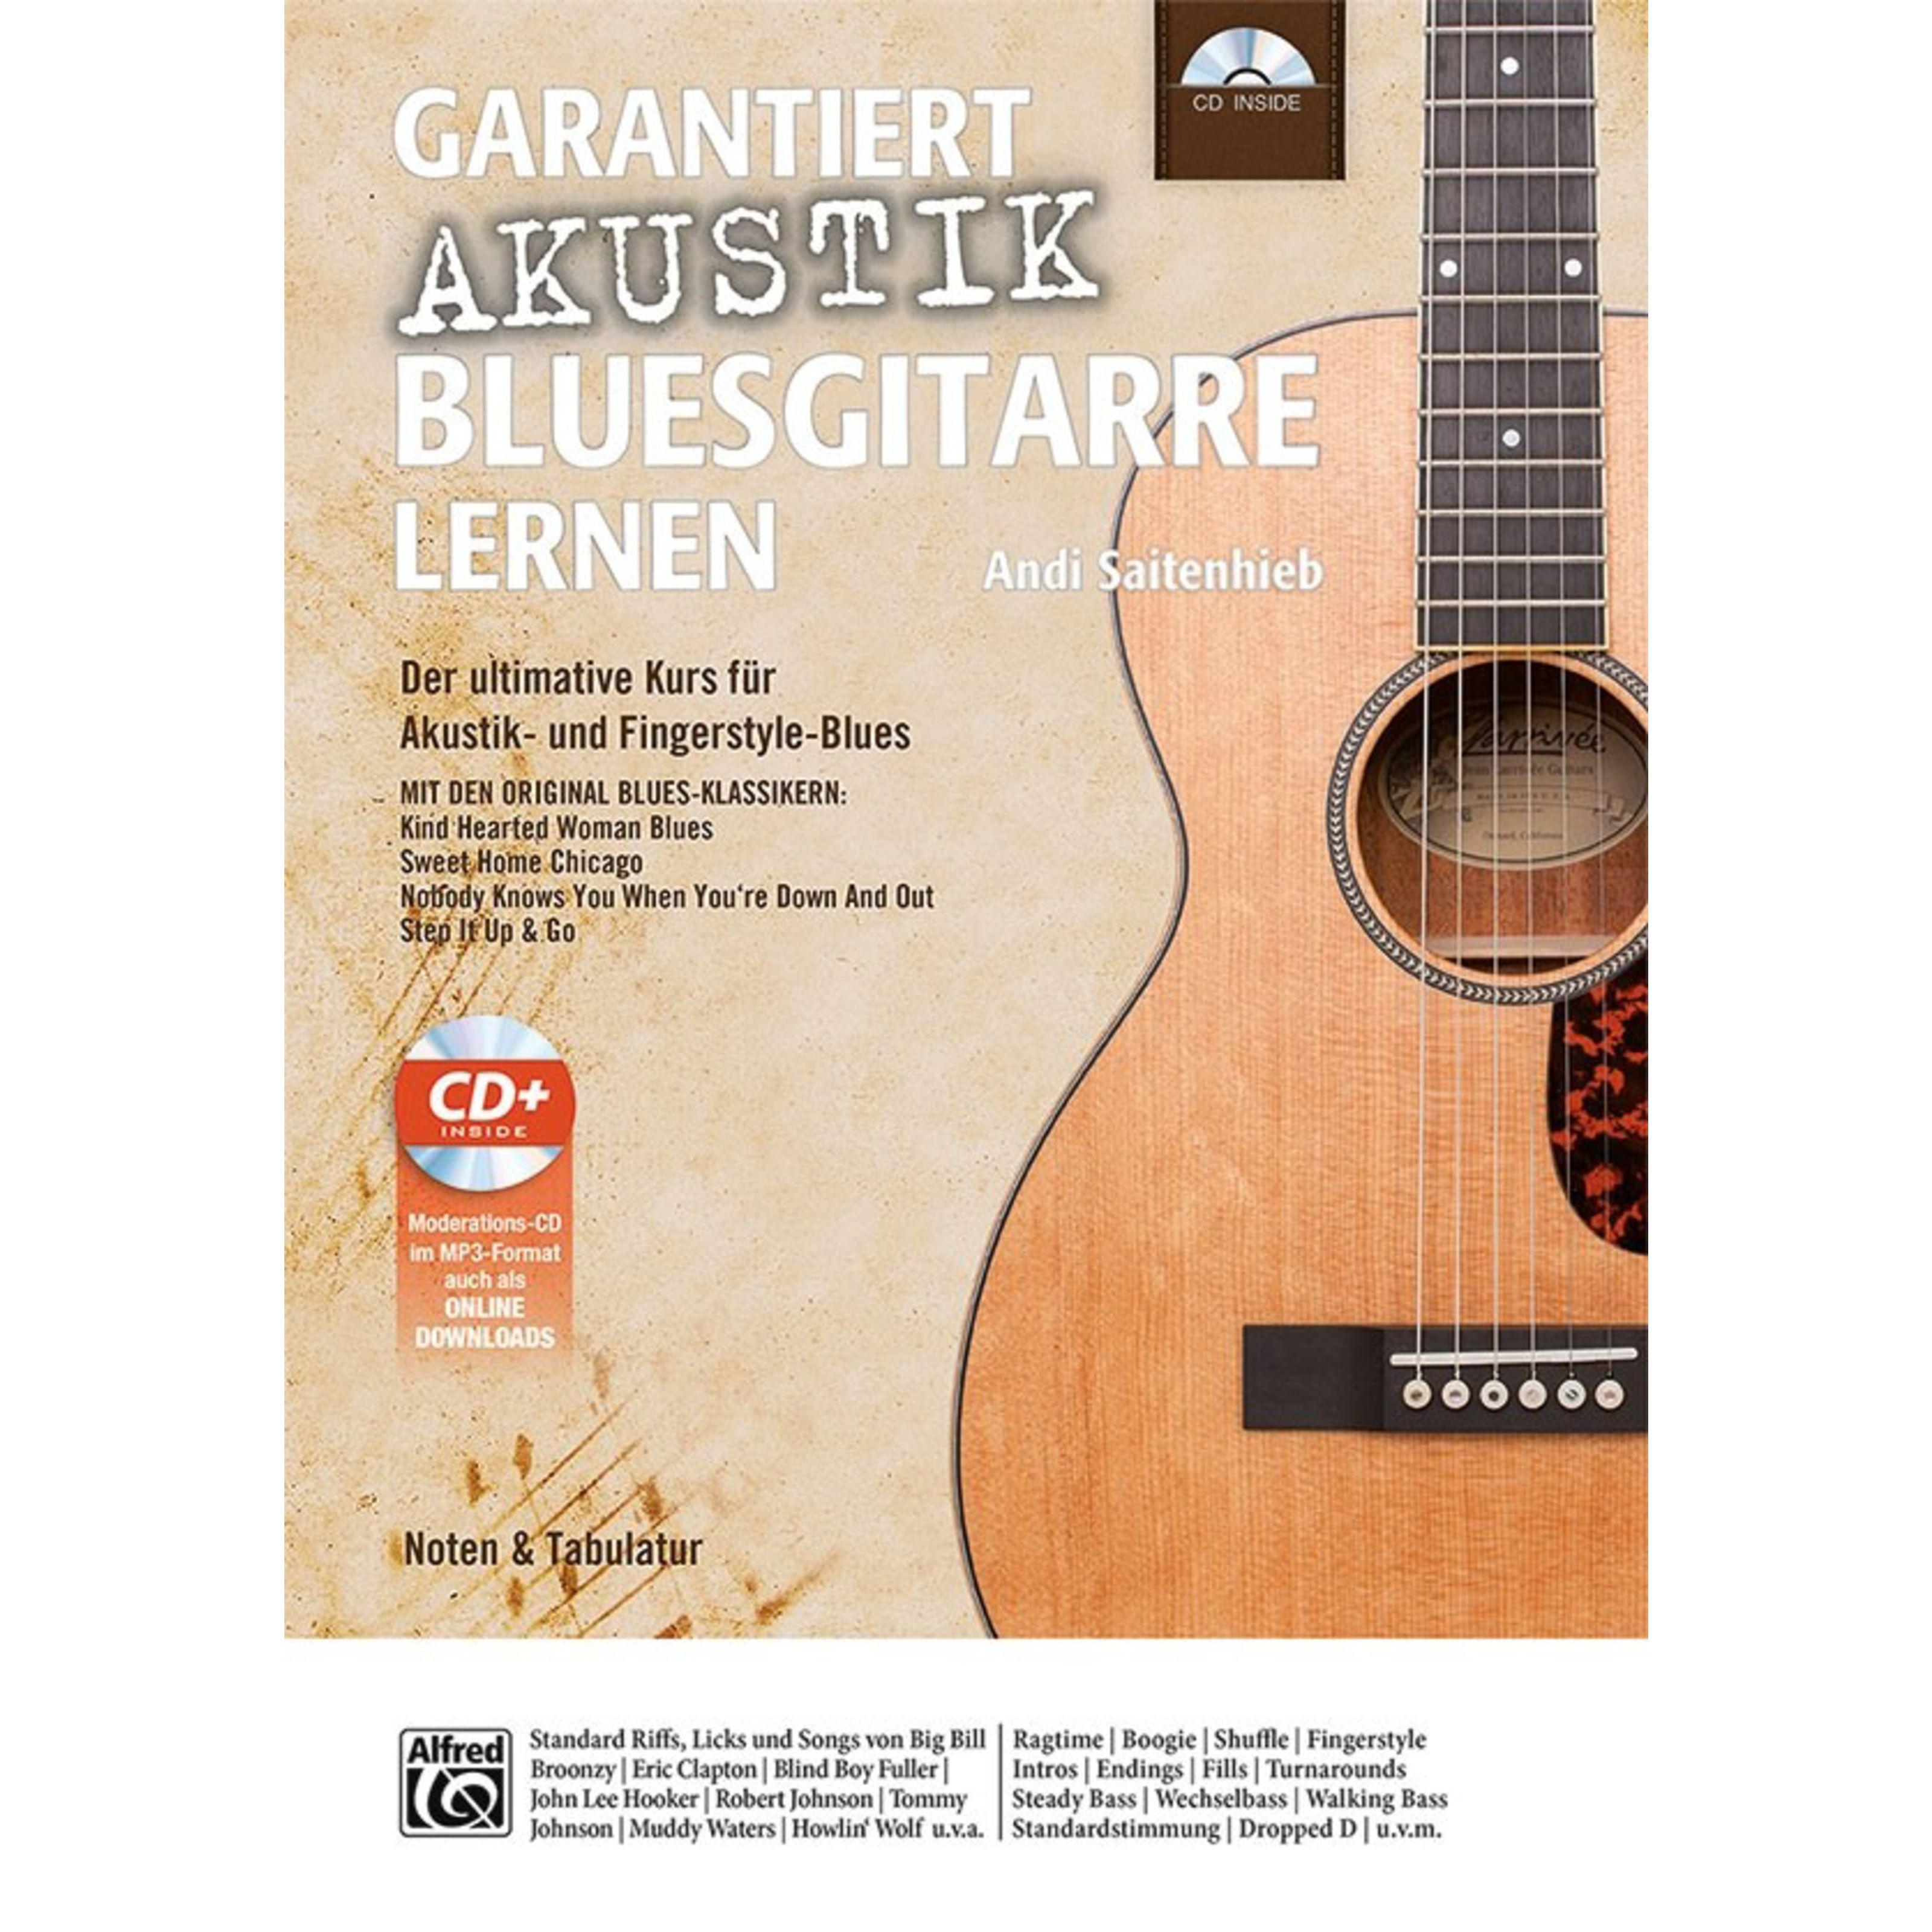 Alfred Music - Garantiert Akustik-Bluesgit. lernen Andi Saitenhieb